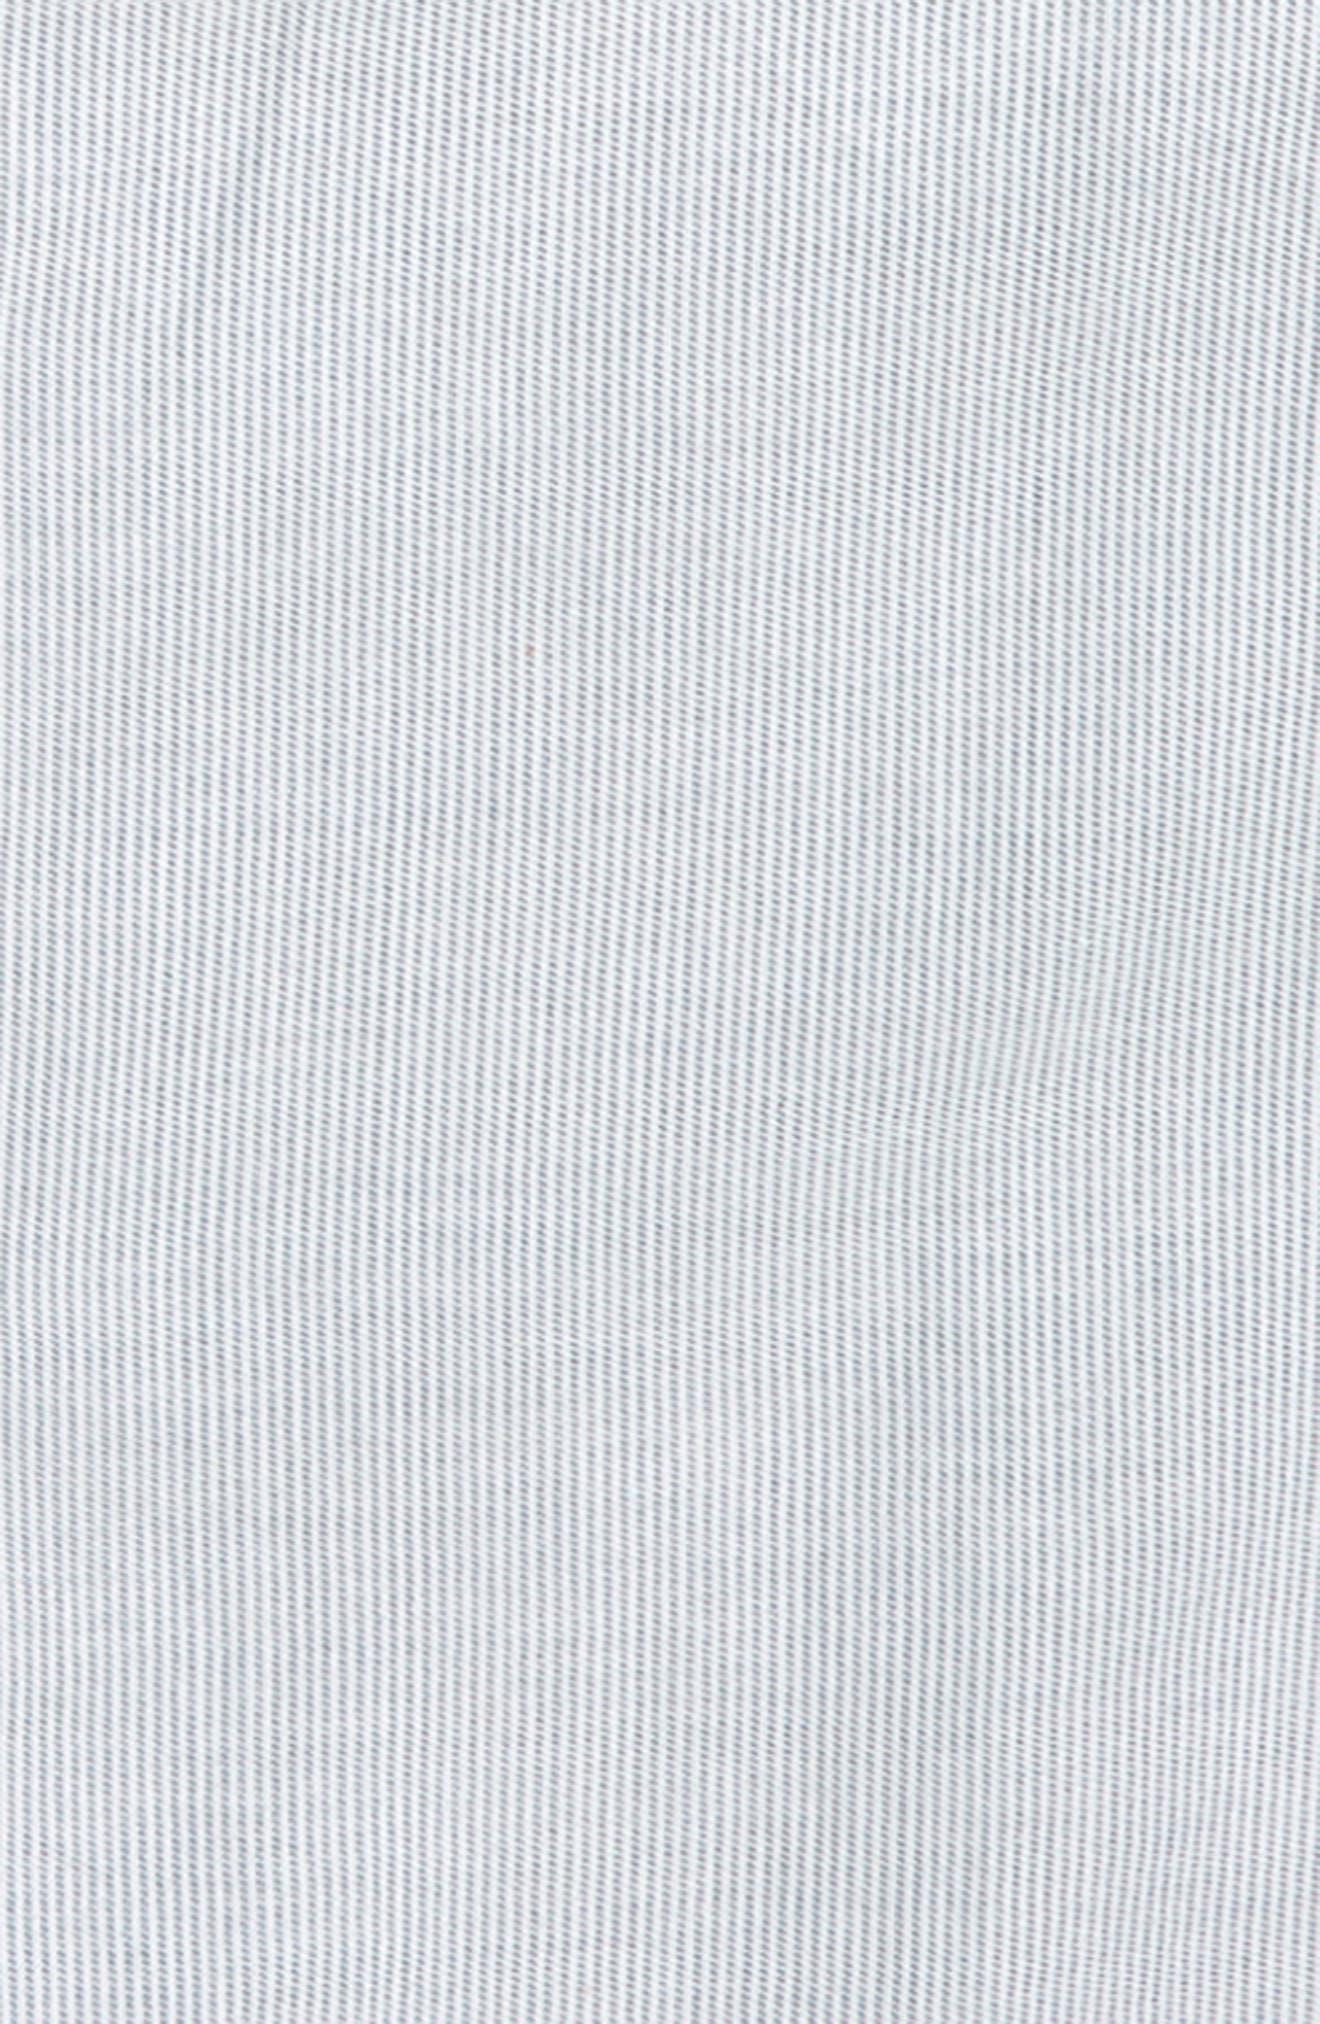 Ruffle Cold Shoulder Top,                             Alternate thumbnail 2, color,                             White- Blue Stripe